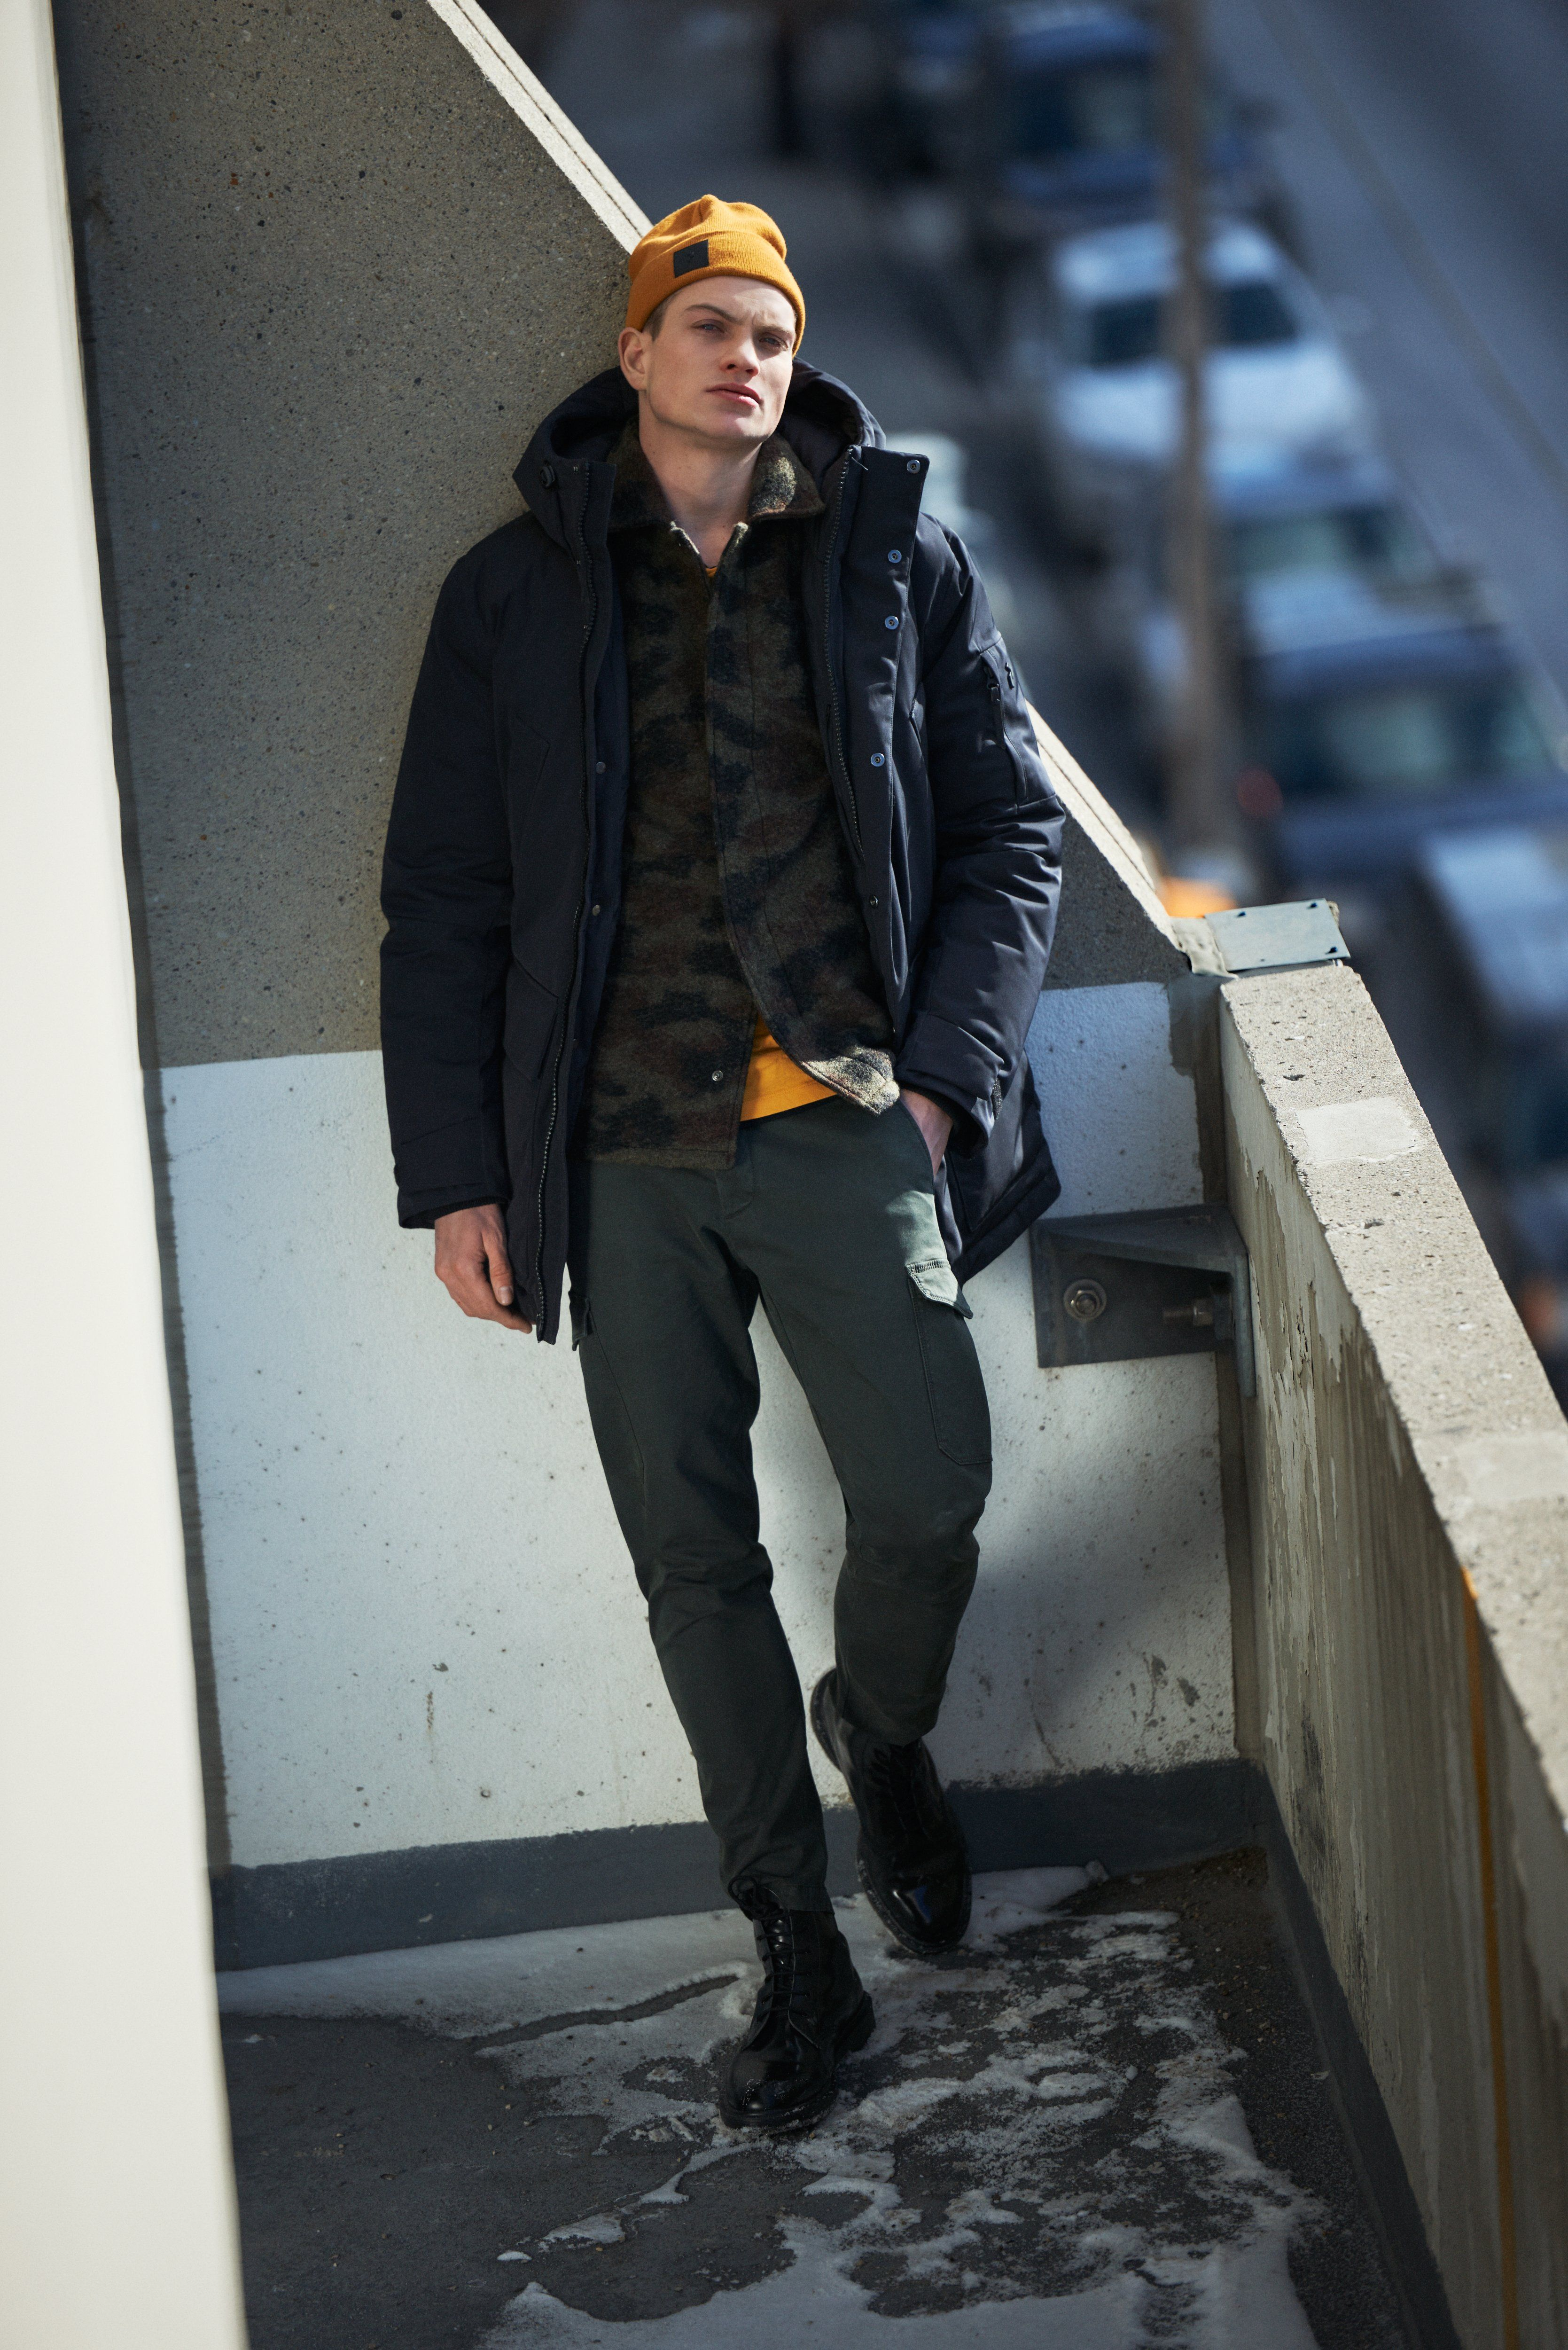 ab1a1cae4276c Perfect combination of Wool Camo Shirt & Unit Jacket. #peakperformance  #unitjacket #woolcamo #hat #urban